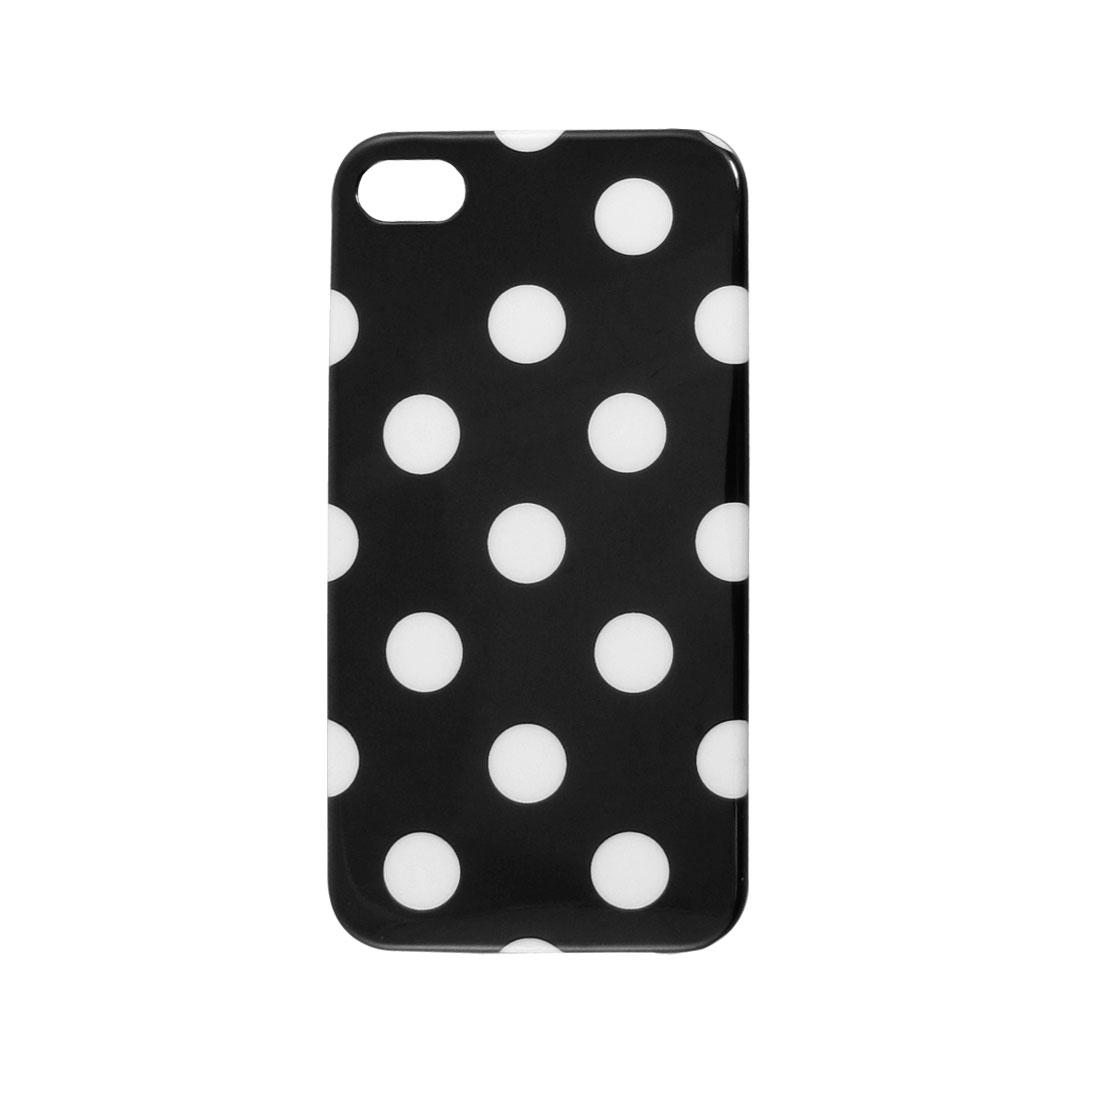 IMD White Dots Decor Black Hard Plastic Back Shell Case Cover for iPhone 4 4G 4S